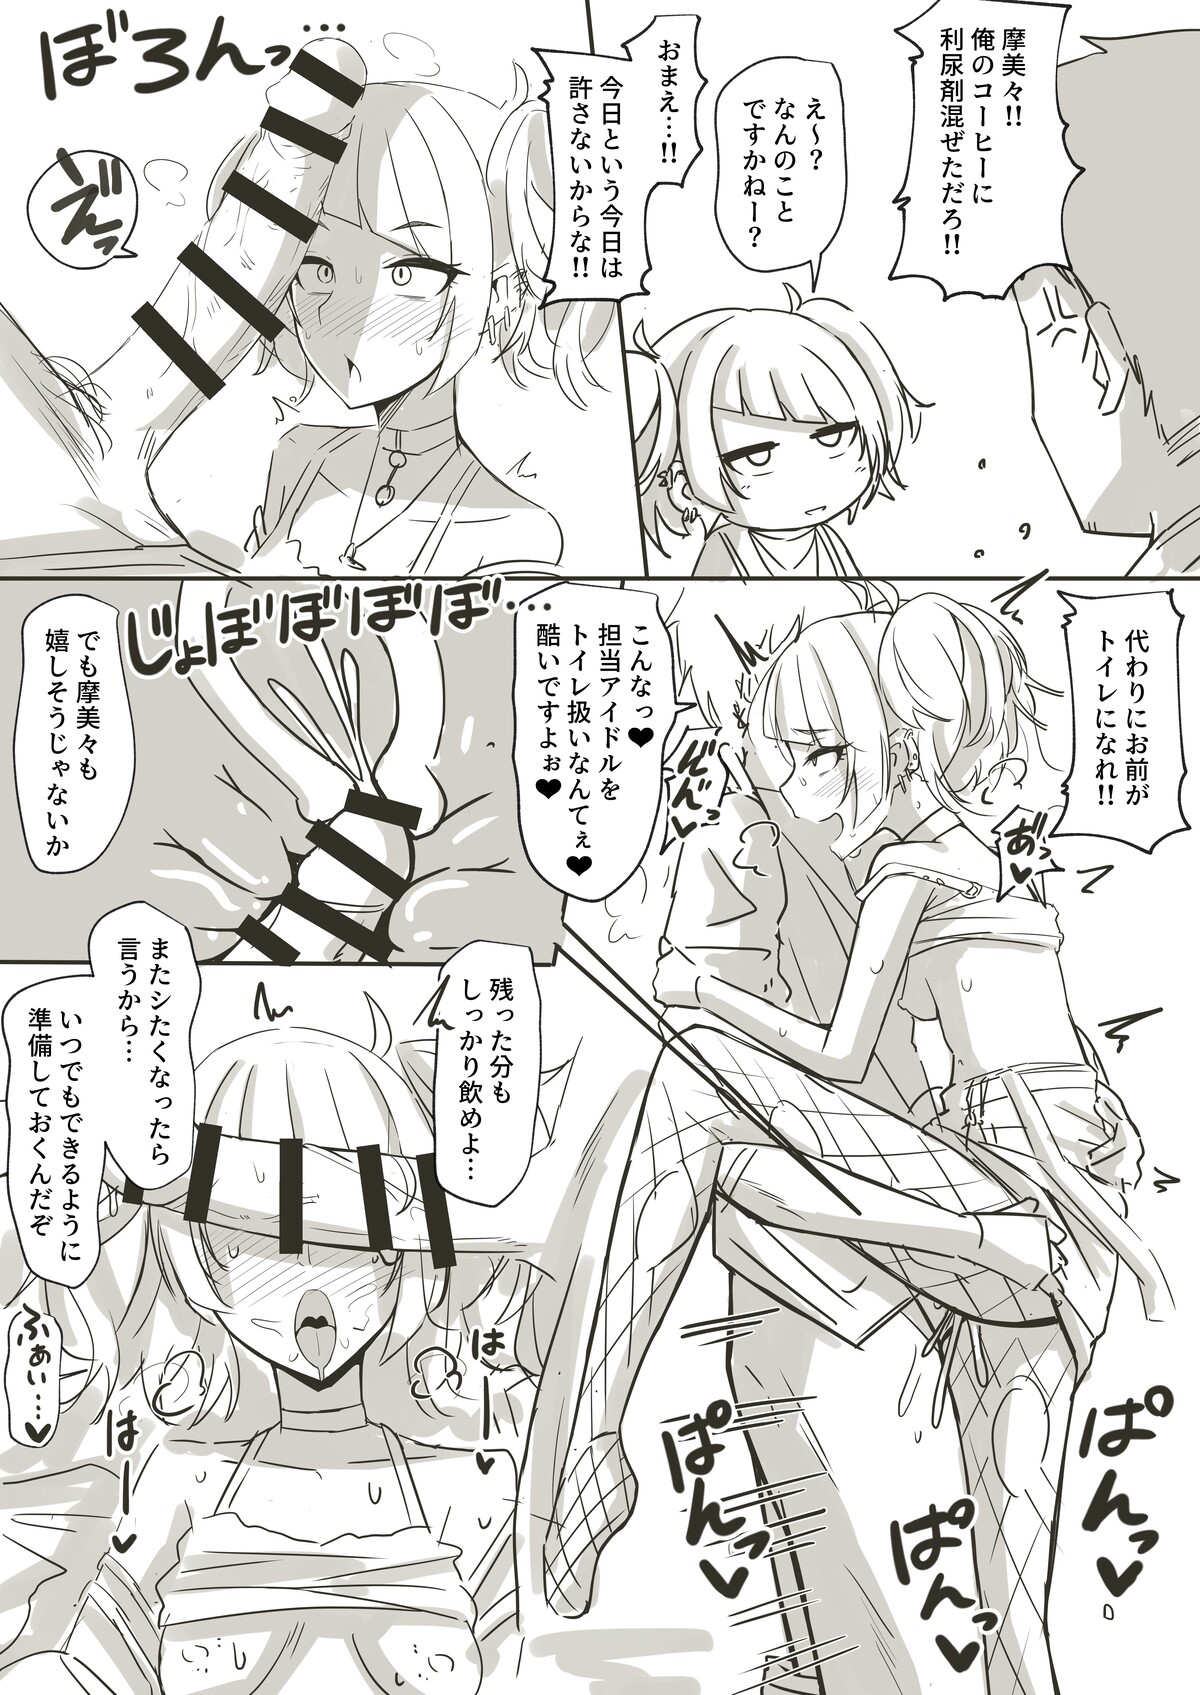 mekakushisao046